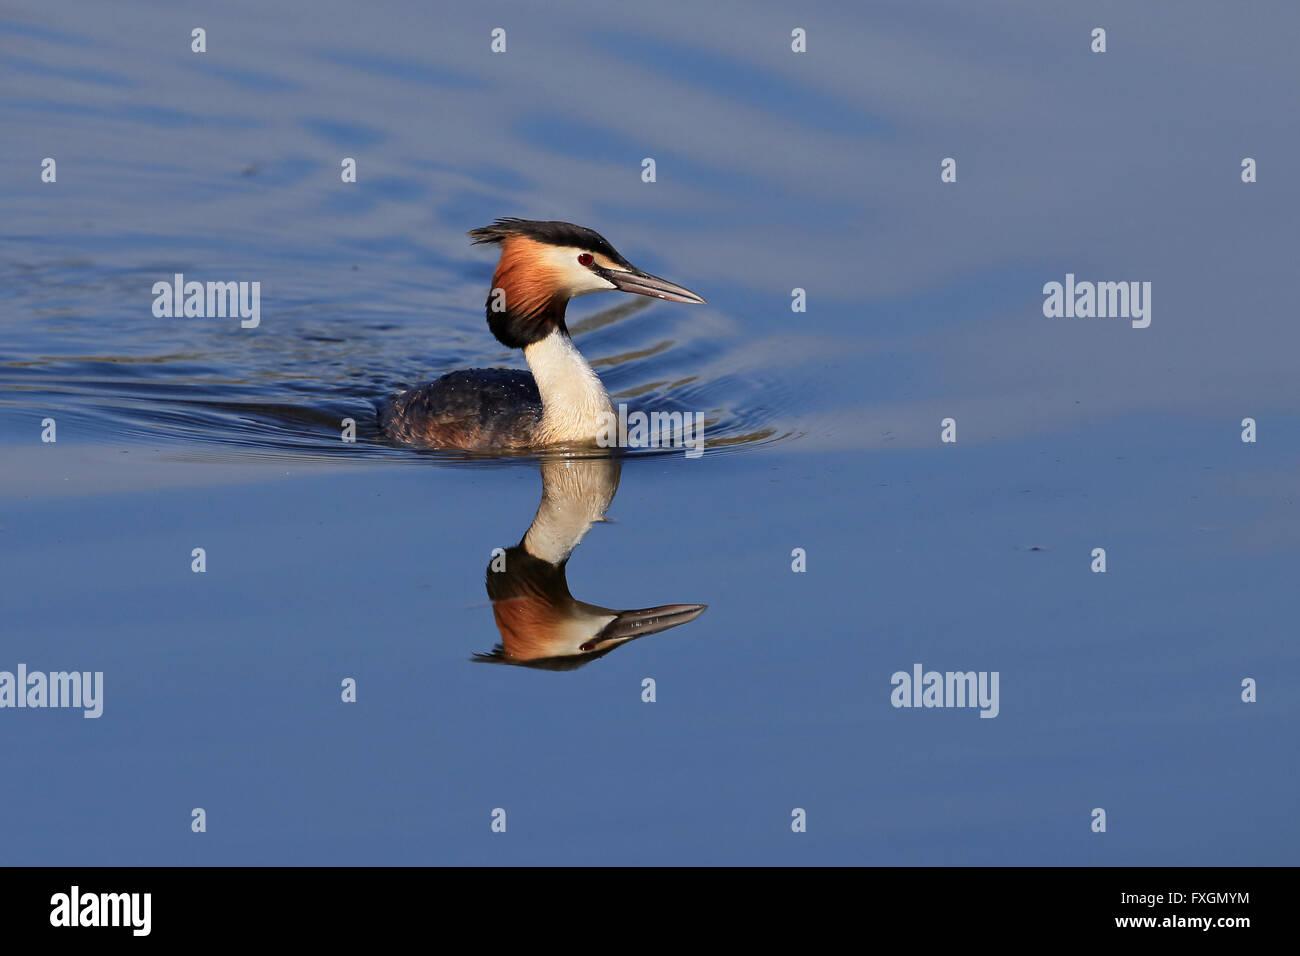 Great Crested Grebe (Podiceps cristatus) - Stock Image